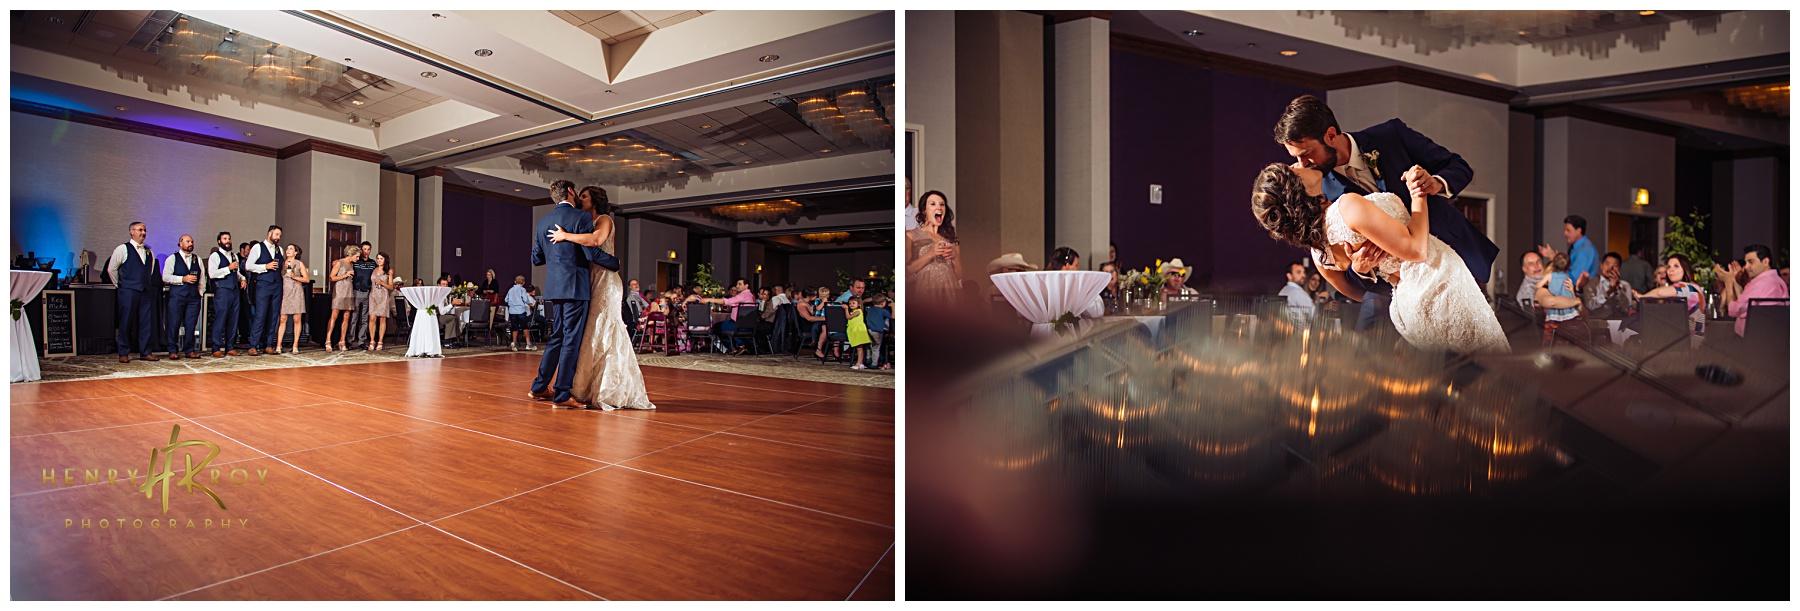 Rapid City Wedding Photographer067.jpg